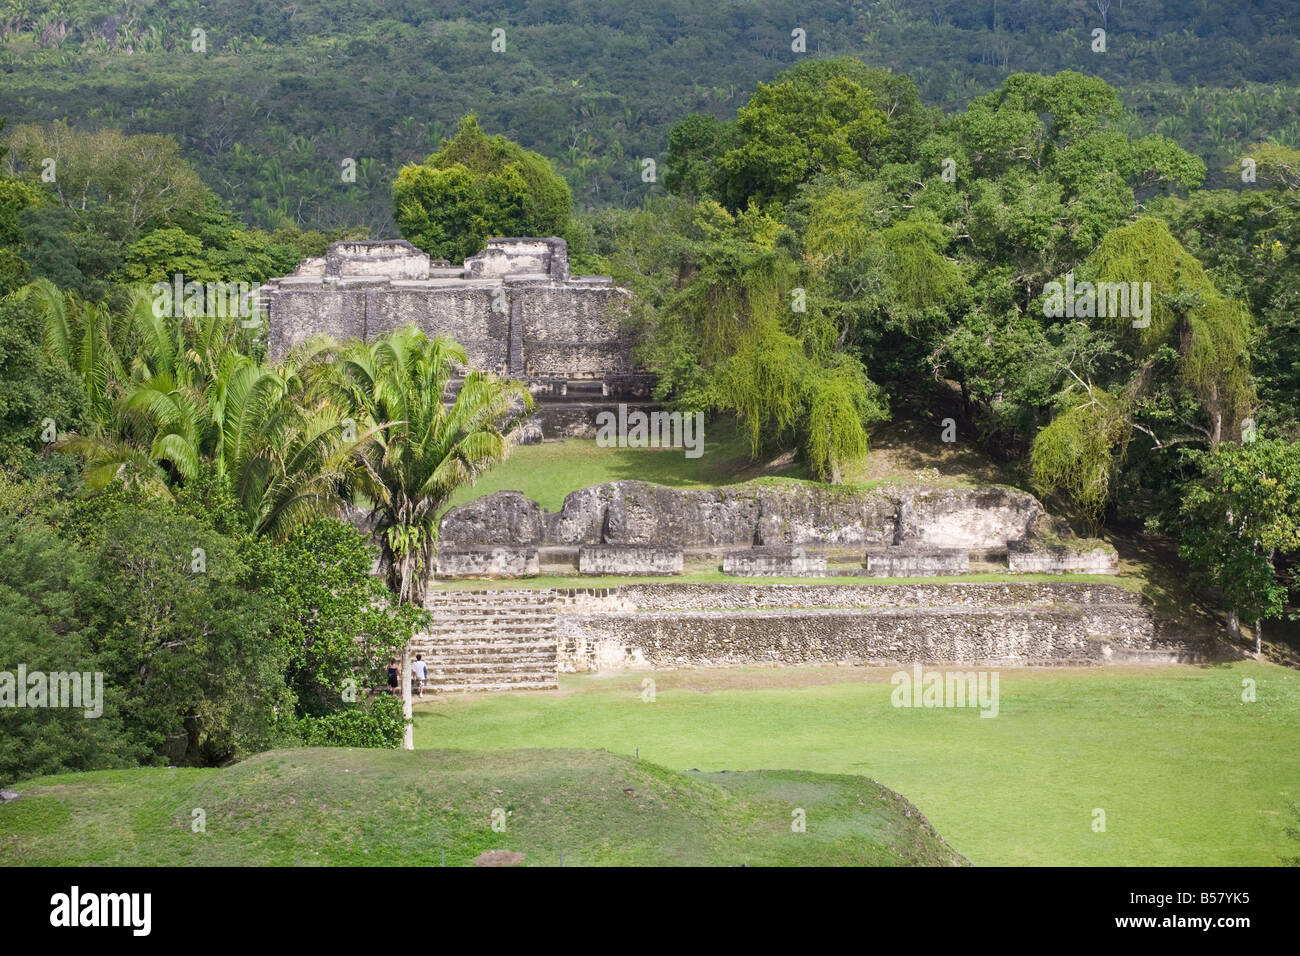 Mayan ruins, Xunantunich, San Ignacio, Belize, Central America - Stock Image